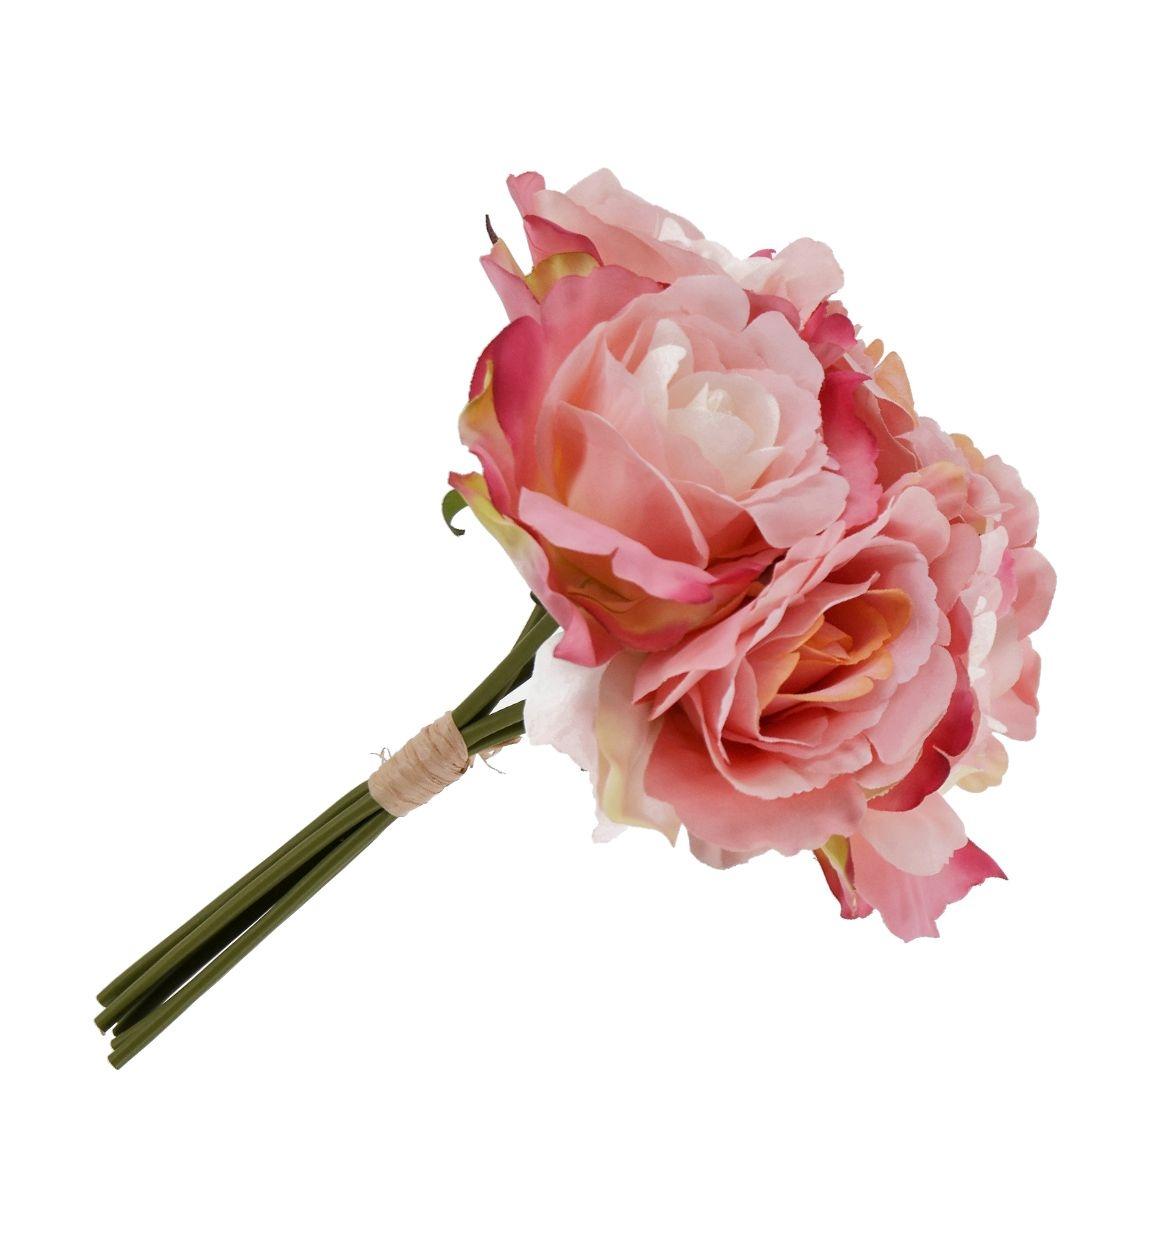 Buchet flori artificiale Ramo Roz, 30 cm poza